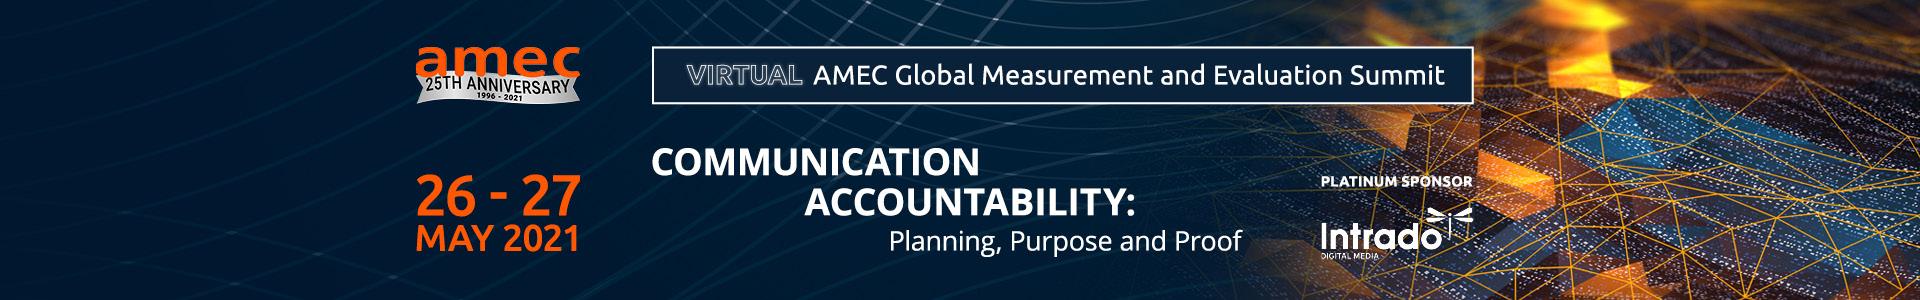 AMEC Summit 2021